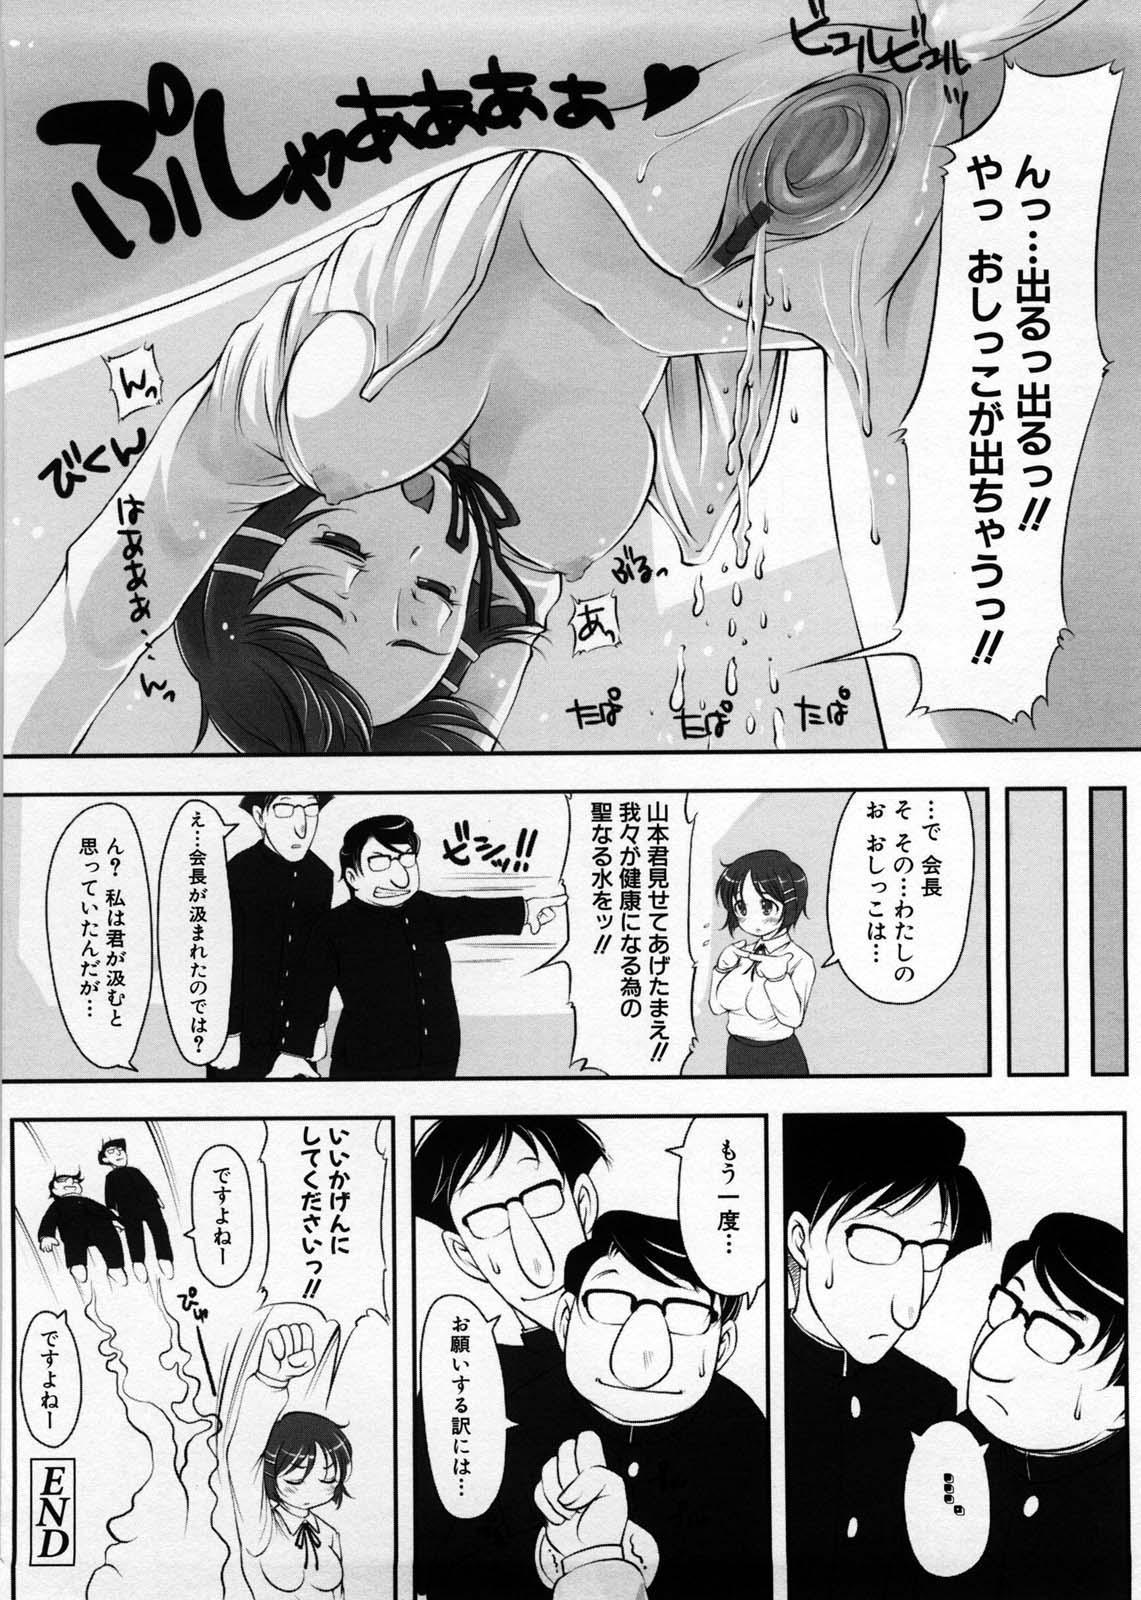 Imouto Ijou Hahaoya Miman 180